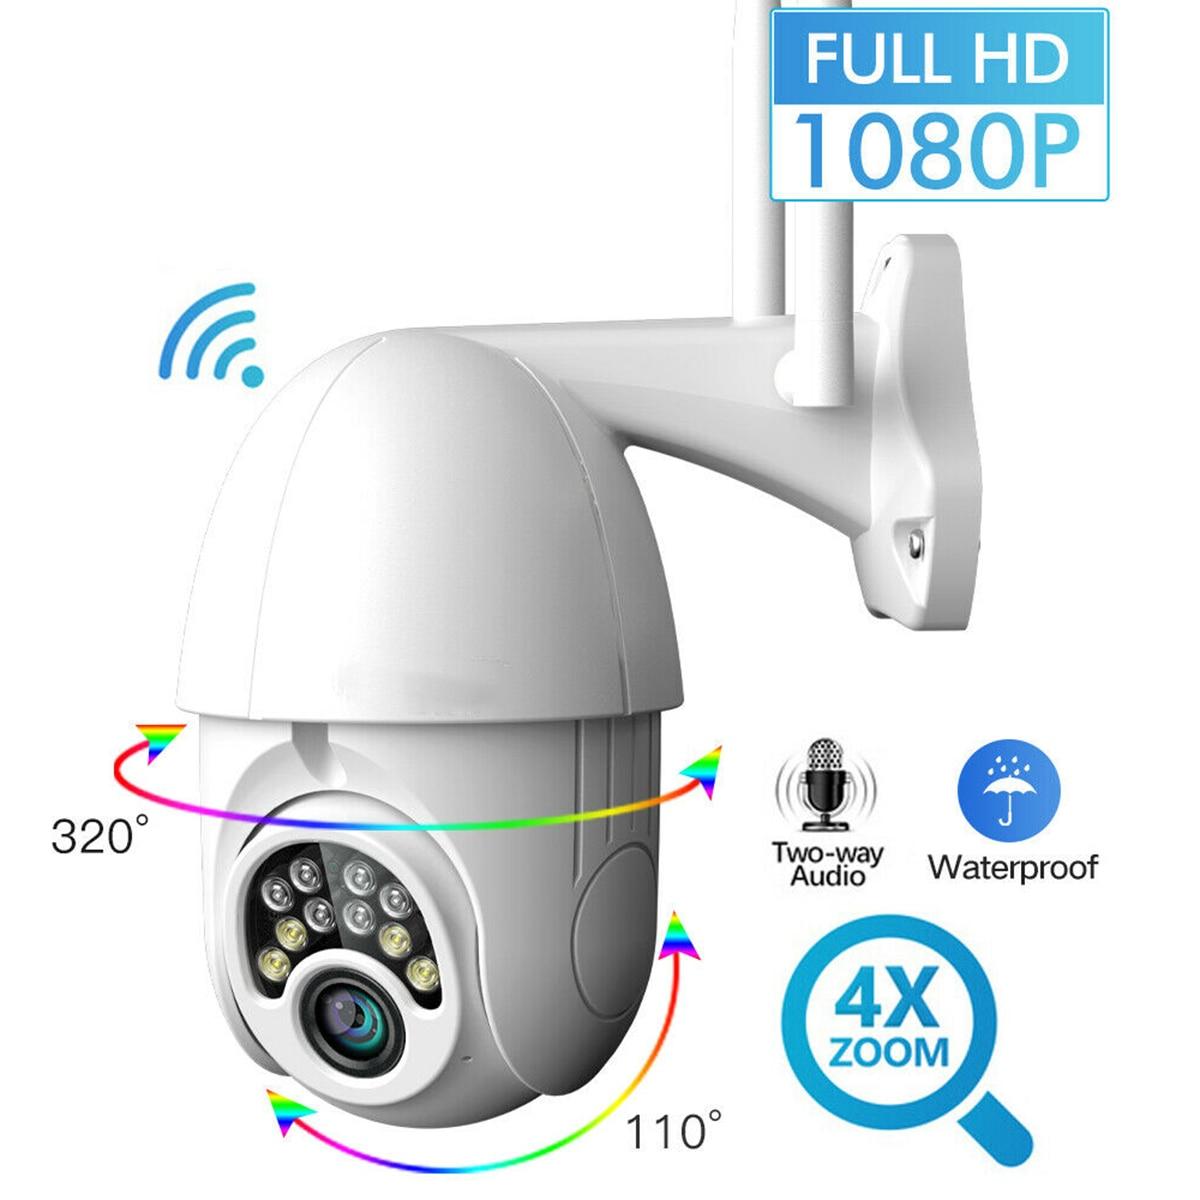 Cámara IP inalámbrica SOONHUA, WIFI, 1080P, para exteriores, cámaras PTZ, cámara impermeable de 2.0MP, compatible con Audio bidireccional con adaptador de corriente